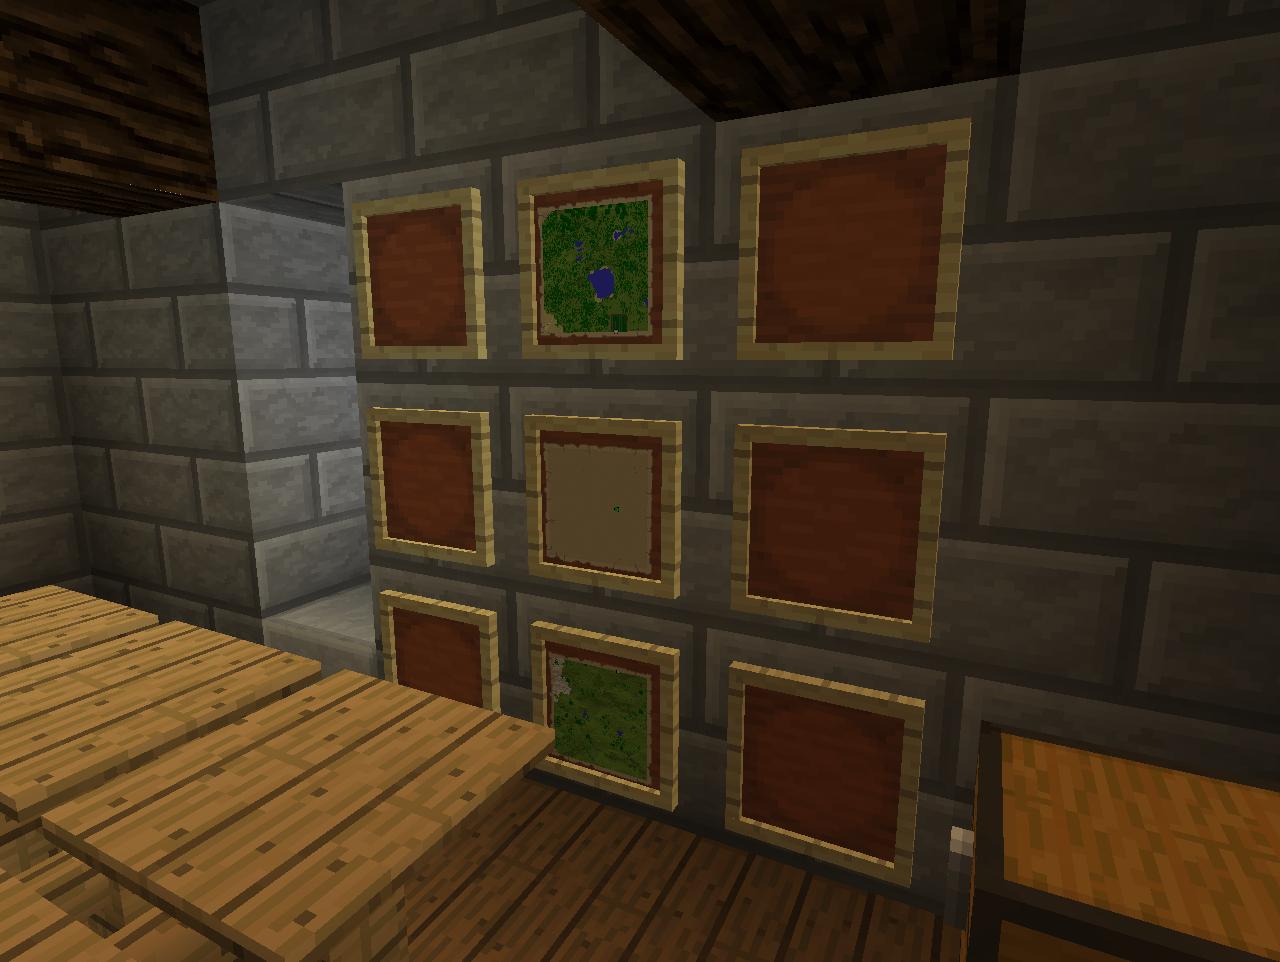 MC-3704] Maps on item frames become blank - JIRA